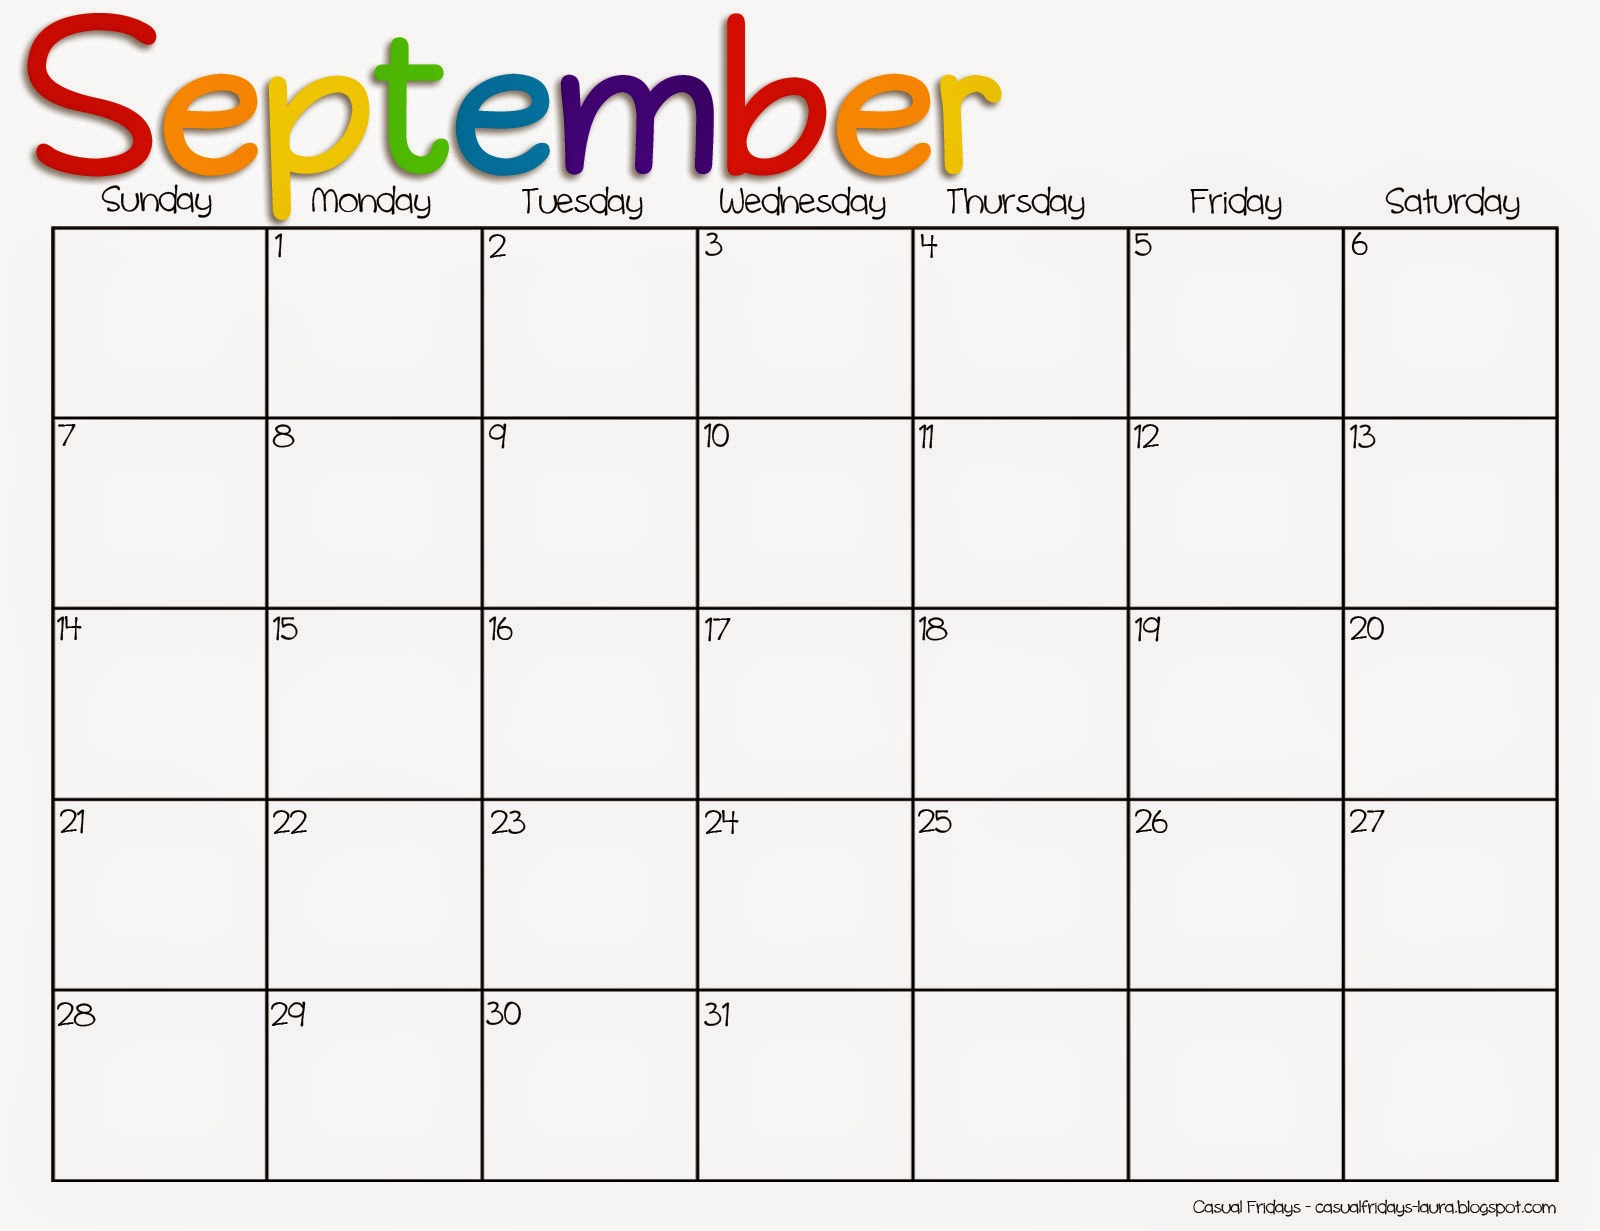 8 Images of Printable September 2015 Calendar